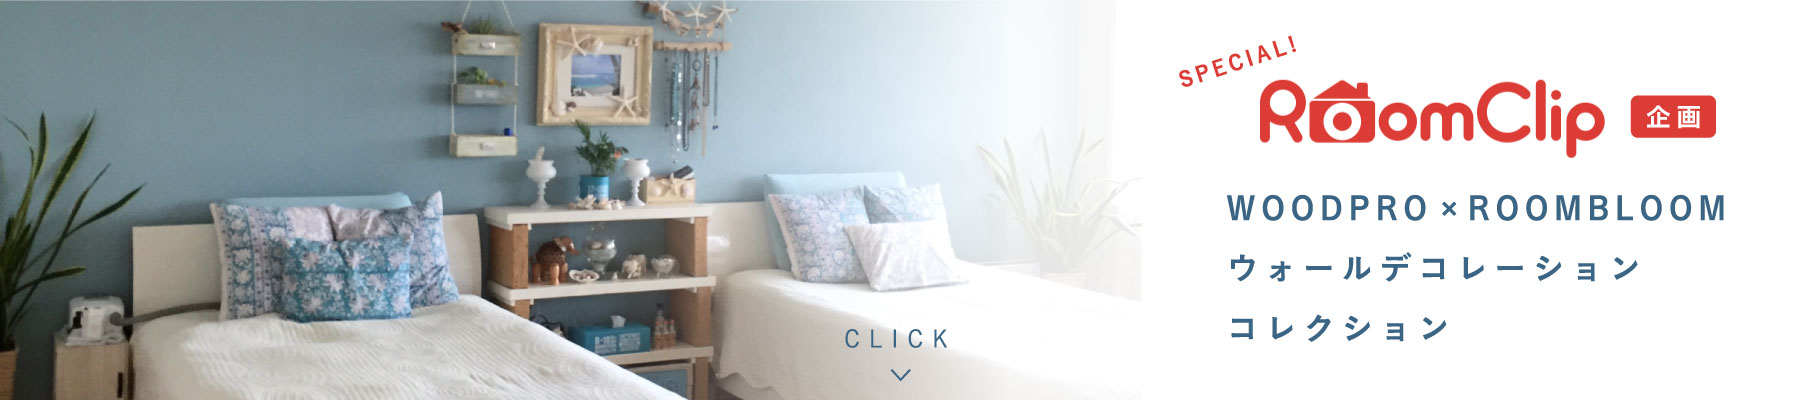 SPECIAL! RoomClip企画 WOODPRO x ROOMBLOOM ウォールデコレーションコレクション